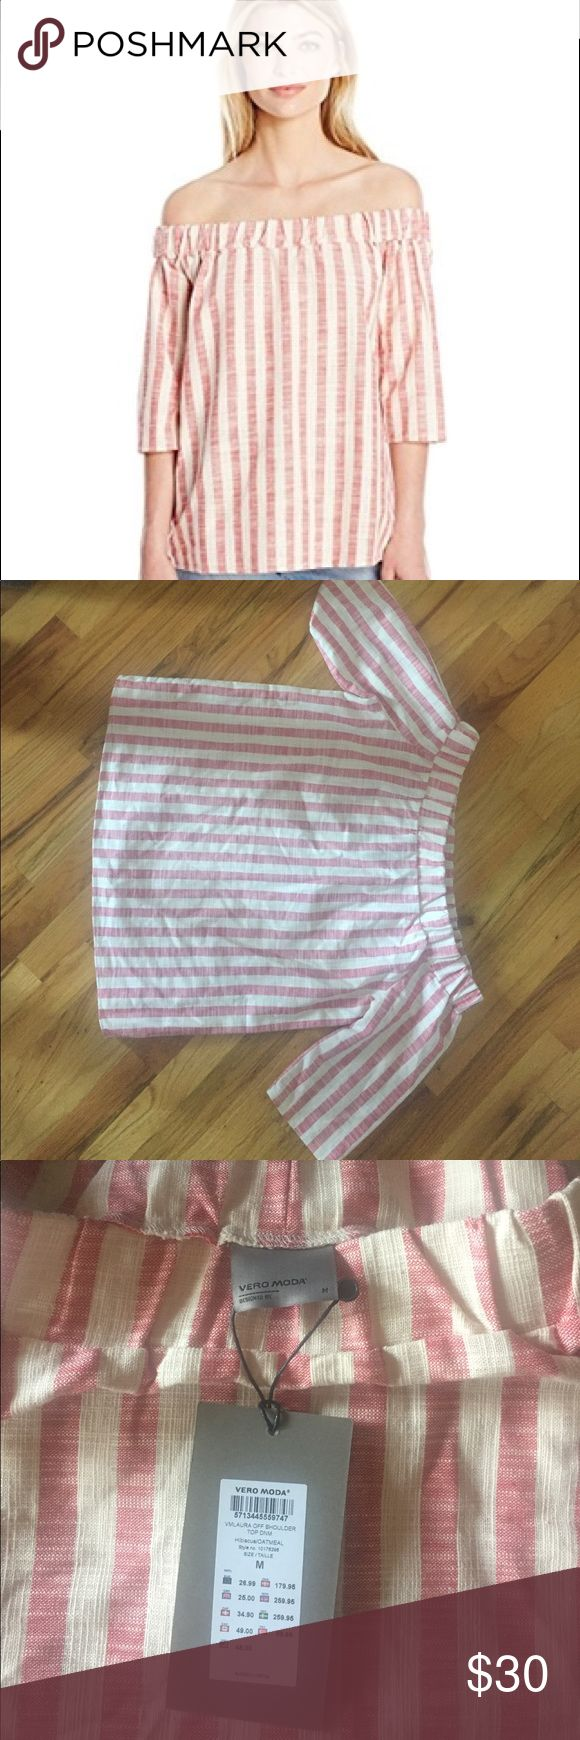 Vero Moda Striped Off Shoulder Bardot Top Vero Moda off shoulder Bardot top. Three quarter sleeves, size medium. NWT. Vero Moda Tops